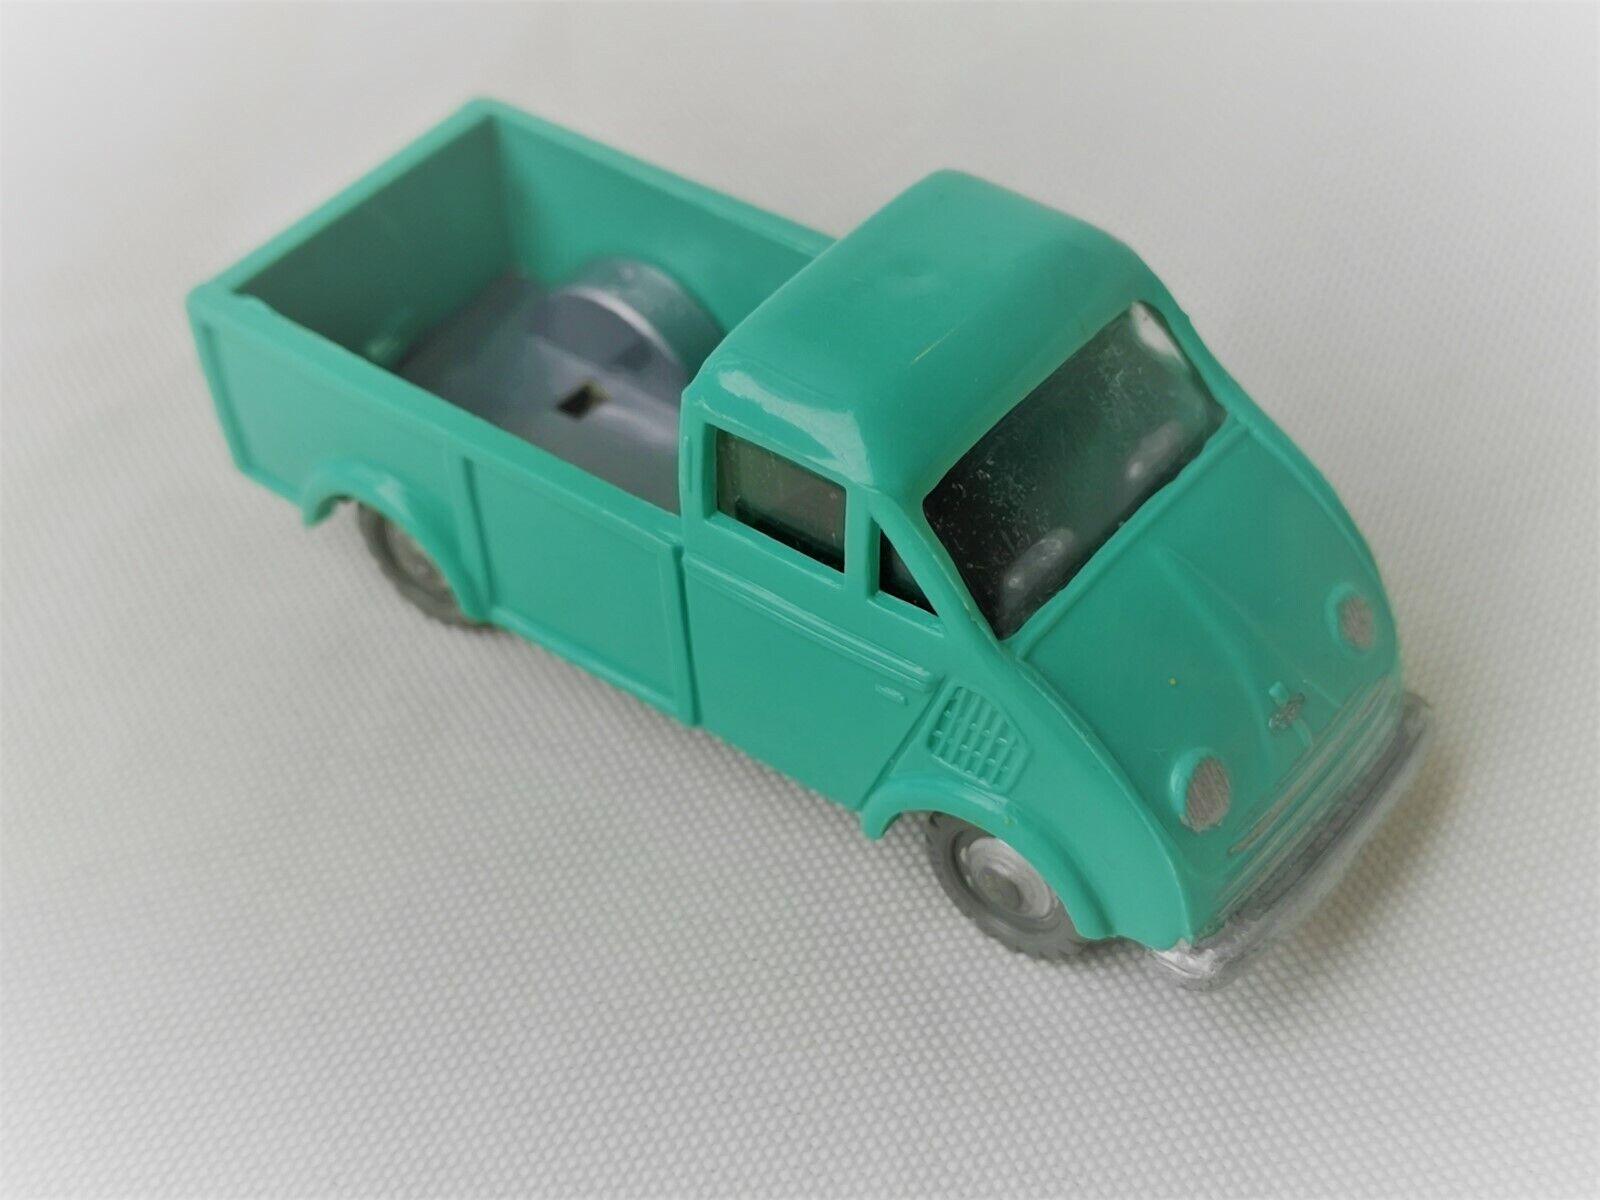 Siku Plastik V25 DKW Metzgerwagen Patina Gr 65533;rough 65533;n V Serie